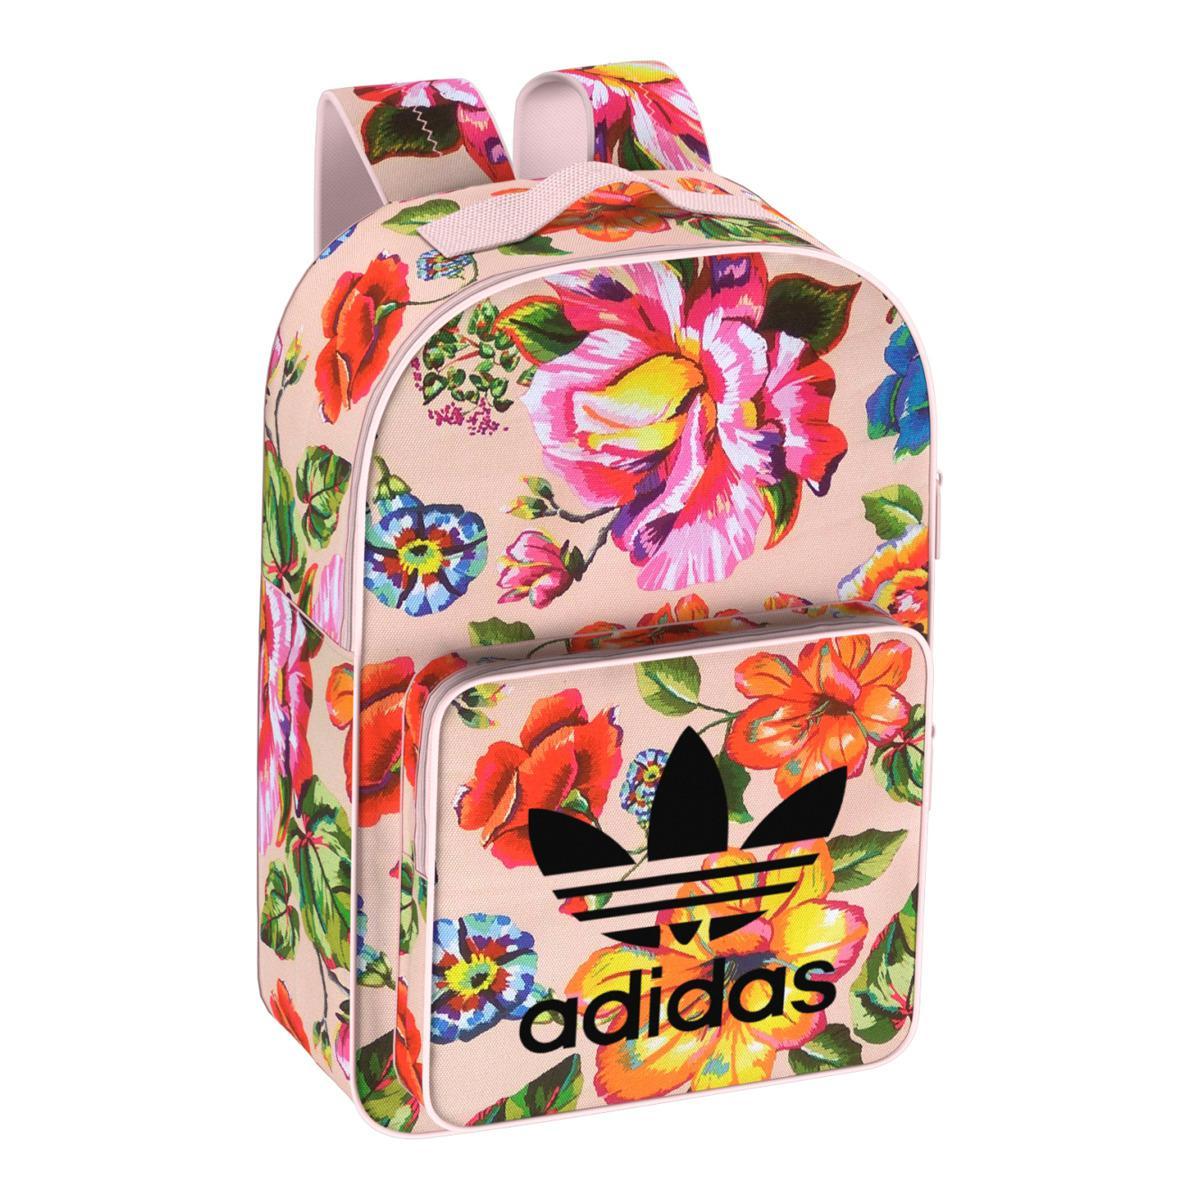 adidas Originals Classic Backpack - Lyst 9ebbd82b1862c